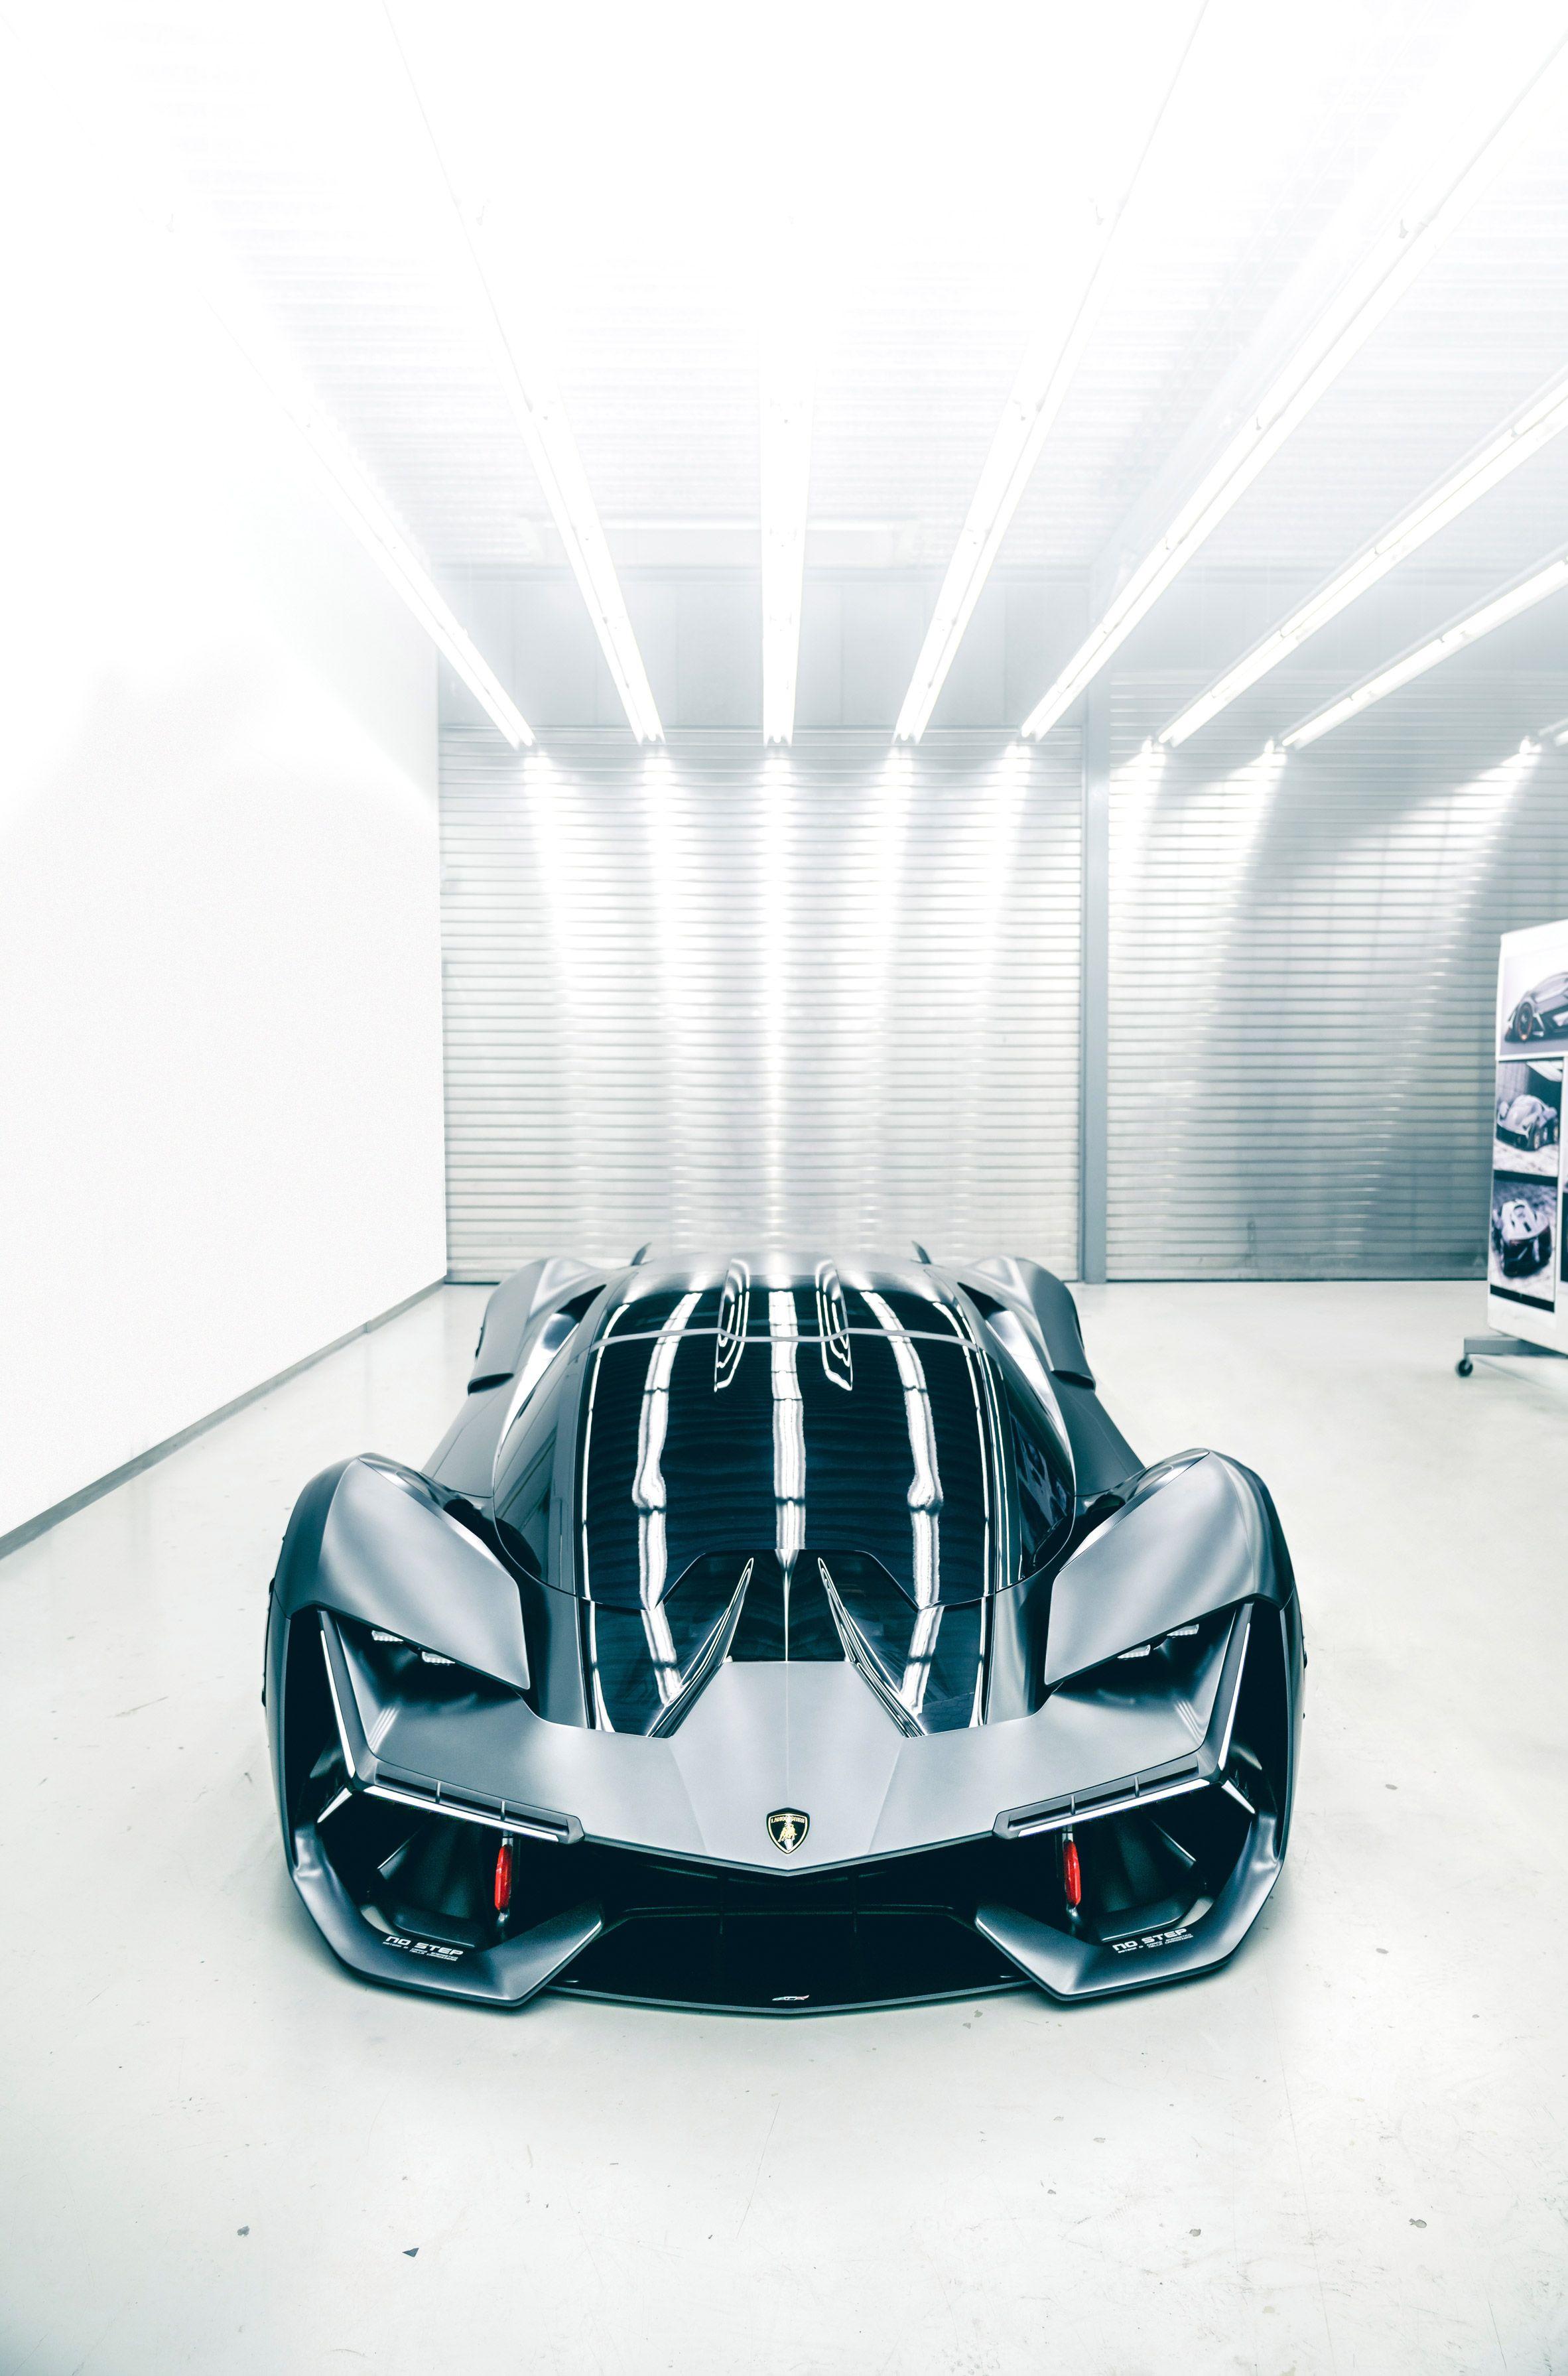 Lamborghini Teams Up With Mit Researchers To Create Self Healing Sports Car Sports Car Lamborghini Supercar Lamborghini